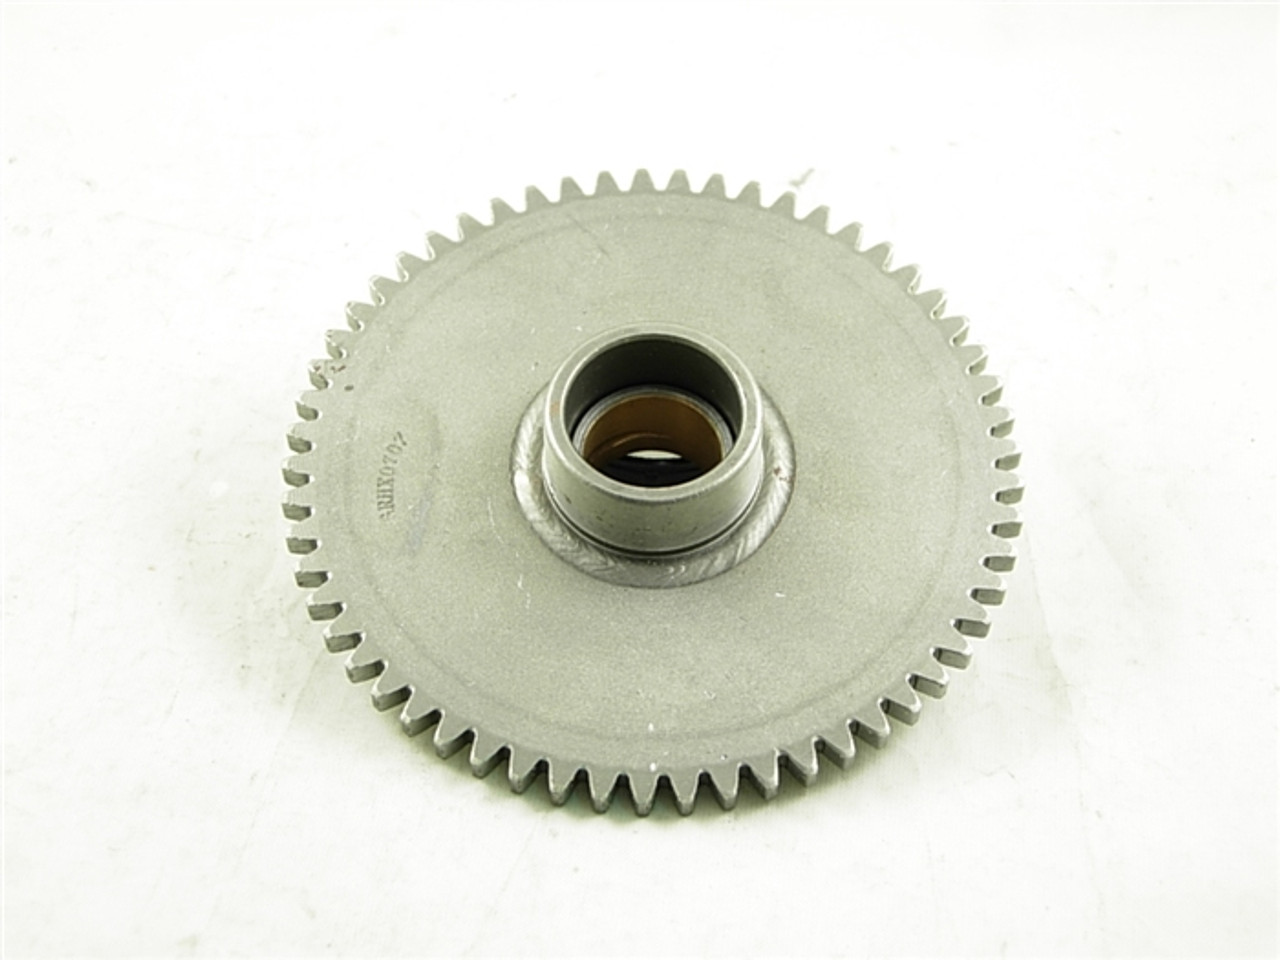 GEAR DRIVE SPROCKET/STARTER GEAR 11216-A68-10